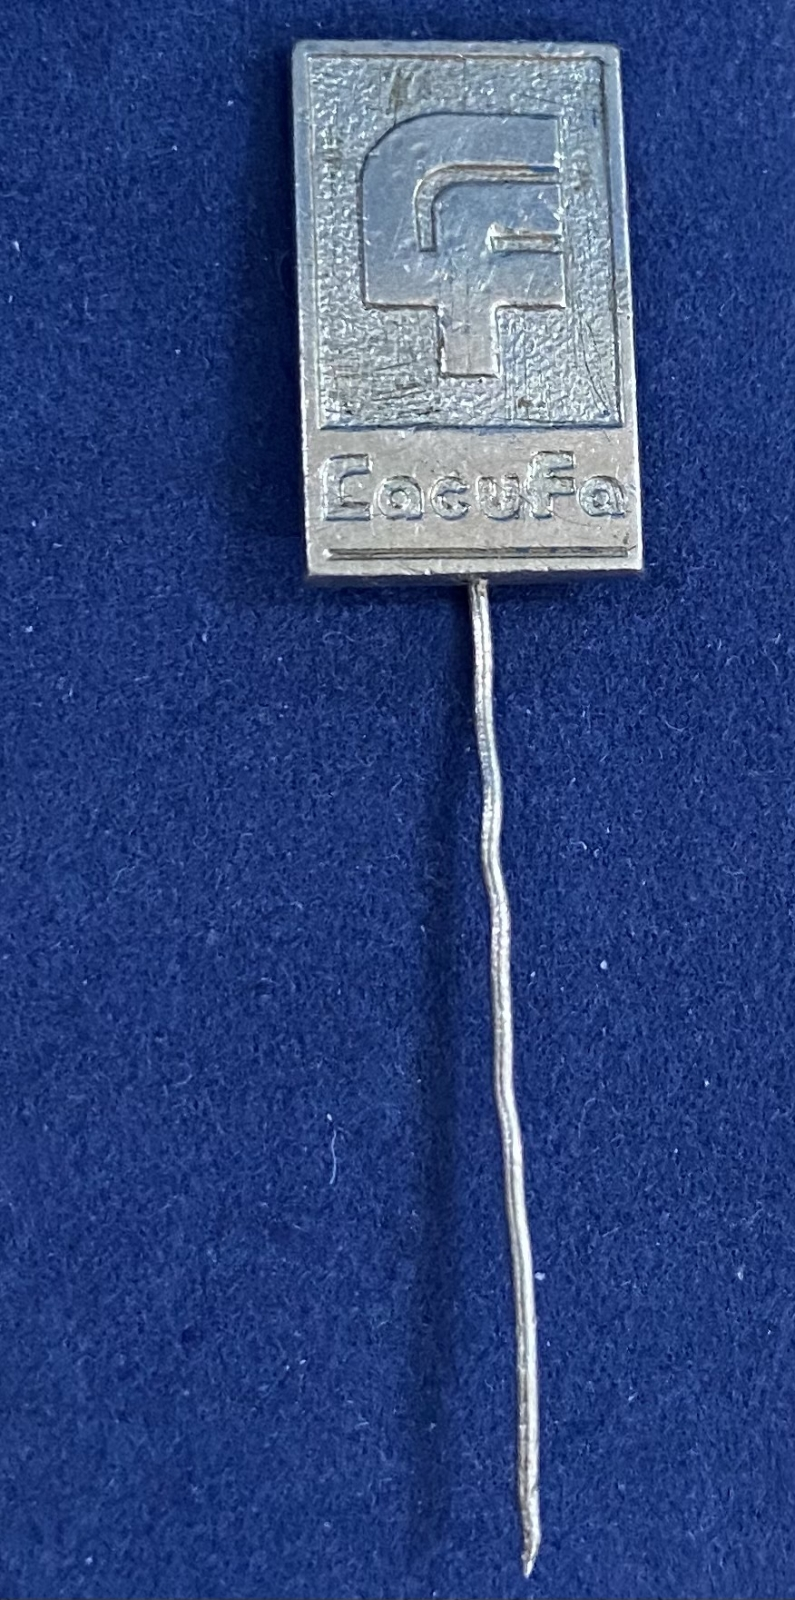 Значок на иголке LacuFa